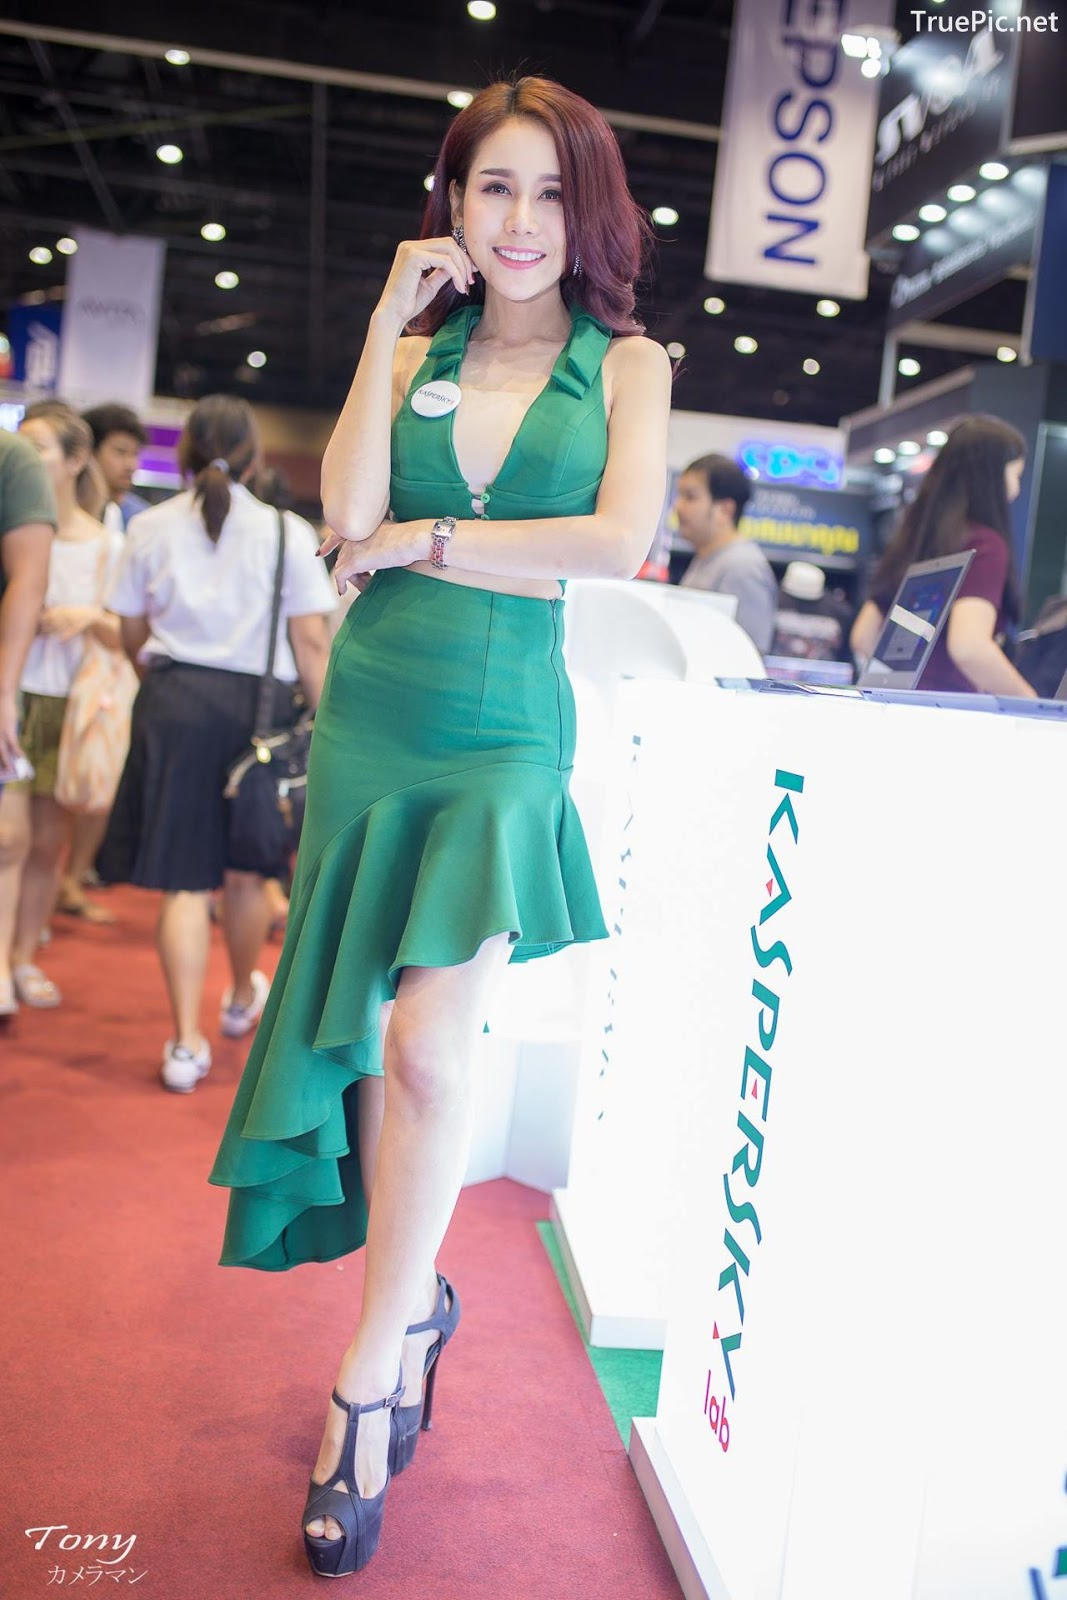 Image-Thailand-Hot-Model-Thai-PG-At-Commart-2018-TruePic.net- Picture-37